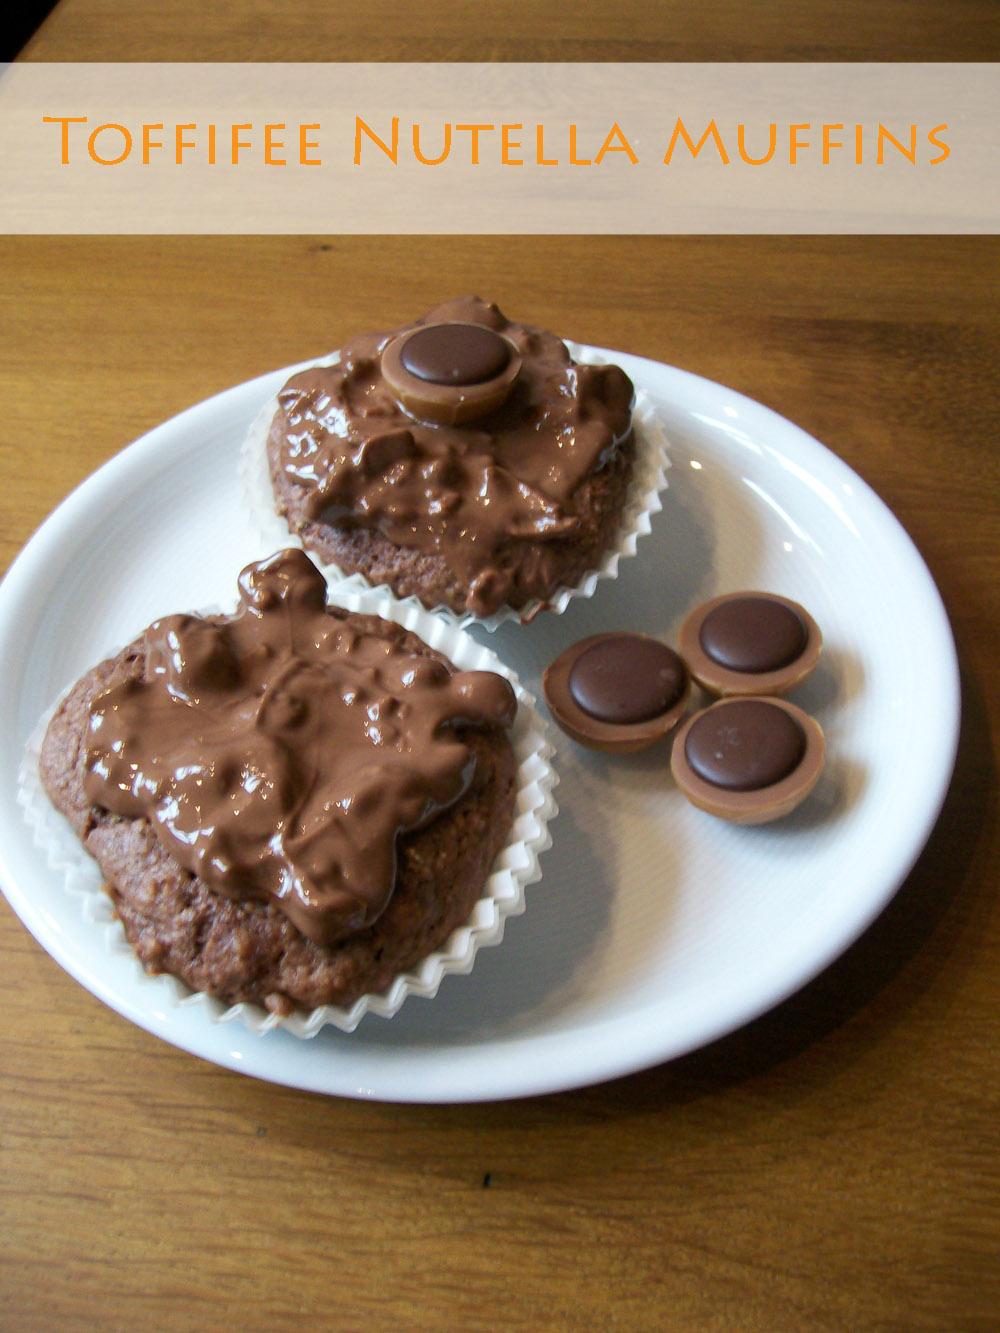 toffifee_nutella_muffins